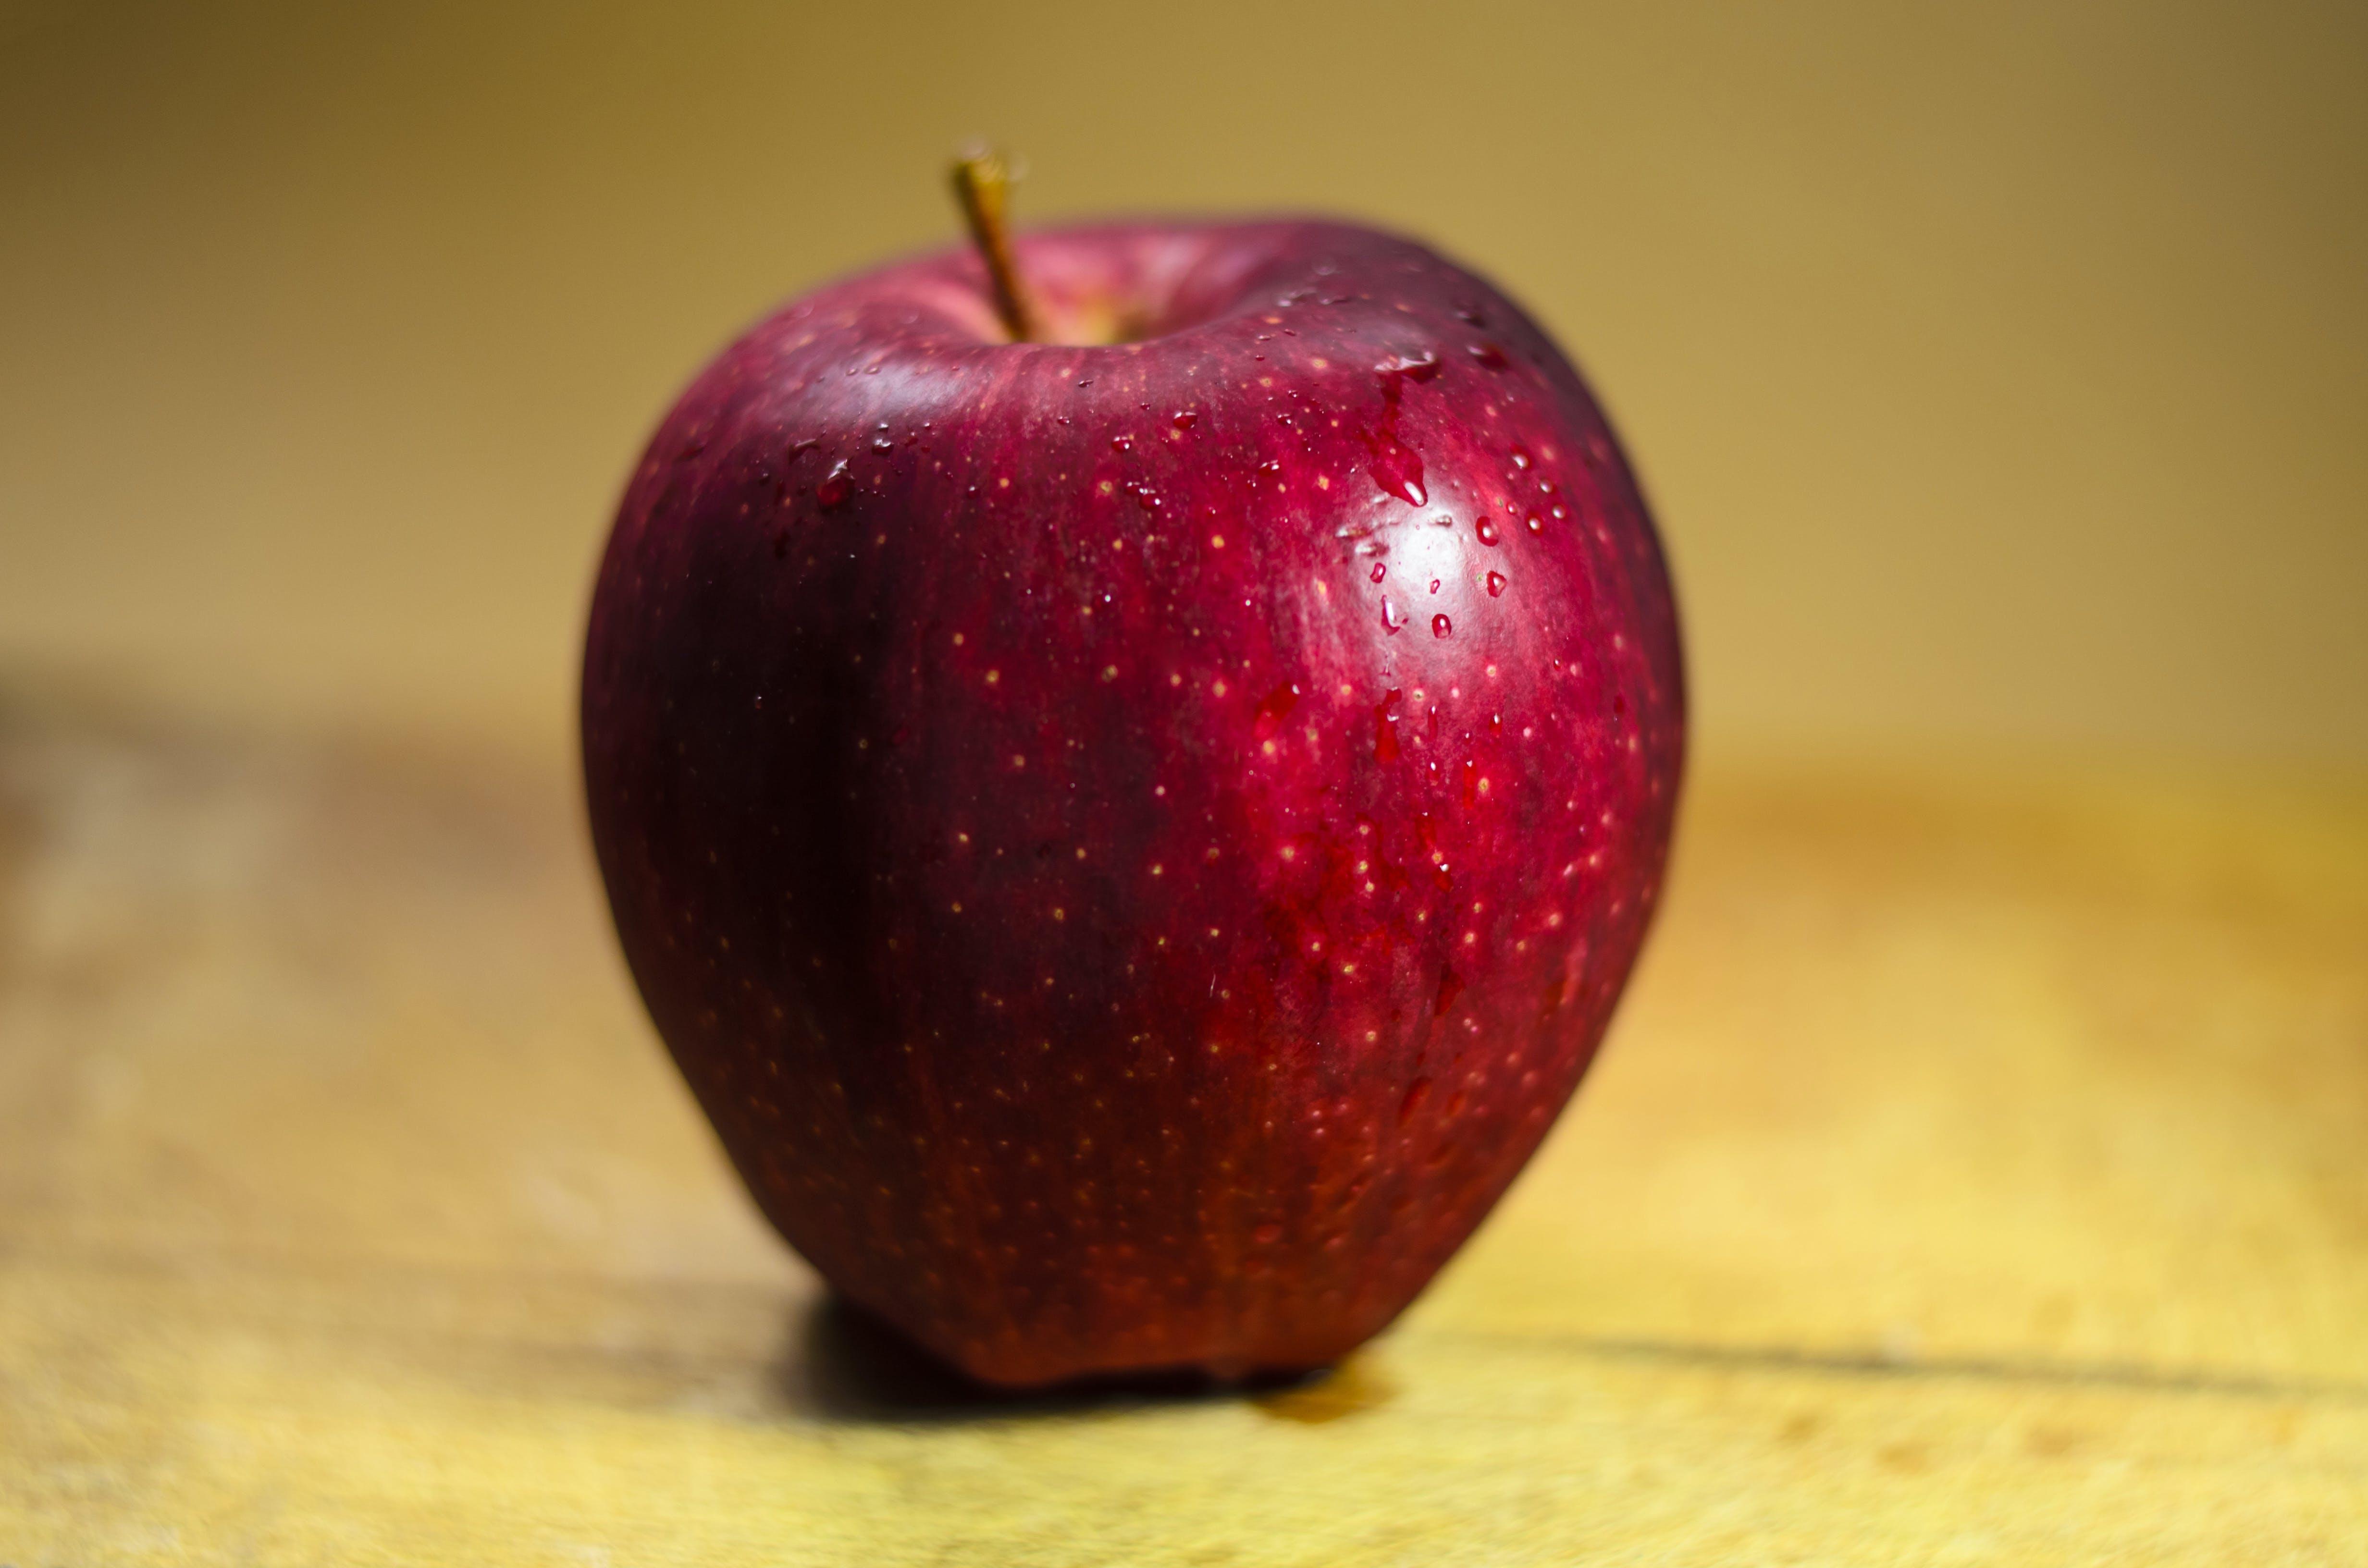 Gratis lagerfoto af alimento, Apple, bruno scramgnon fotografia, comida